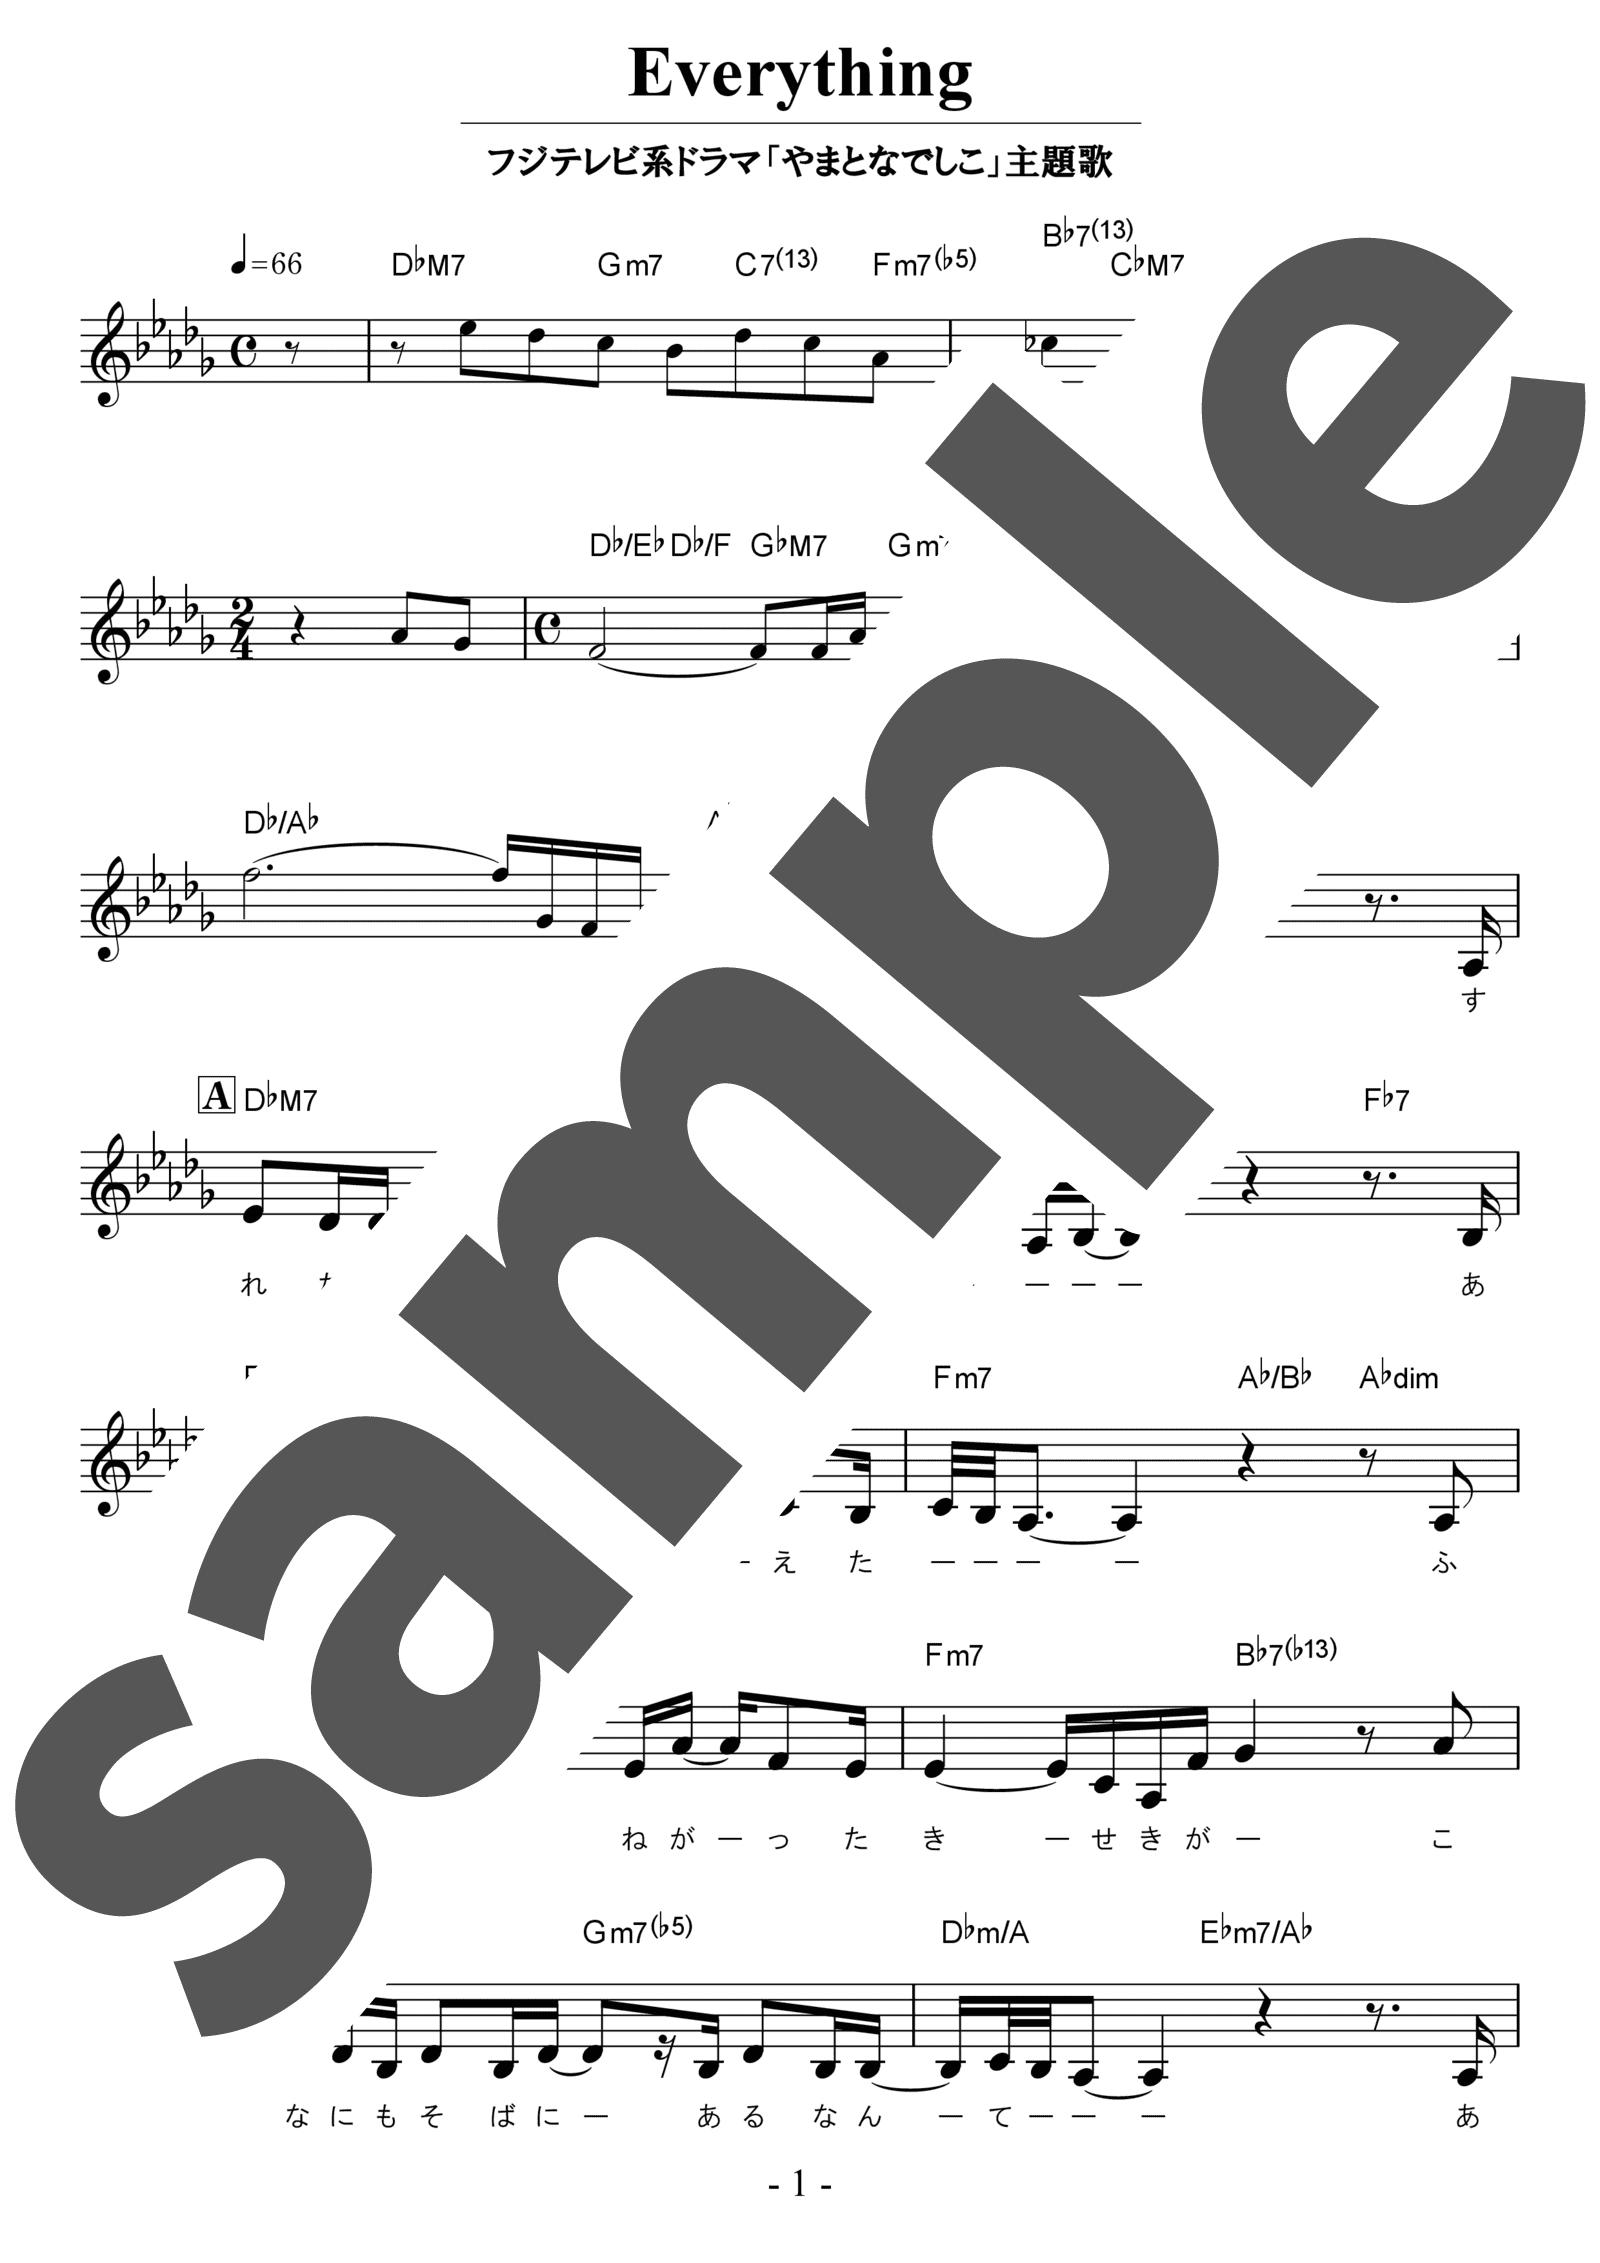 「Everything」のサンプル楽譜